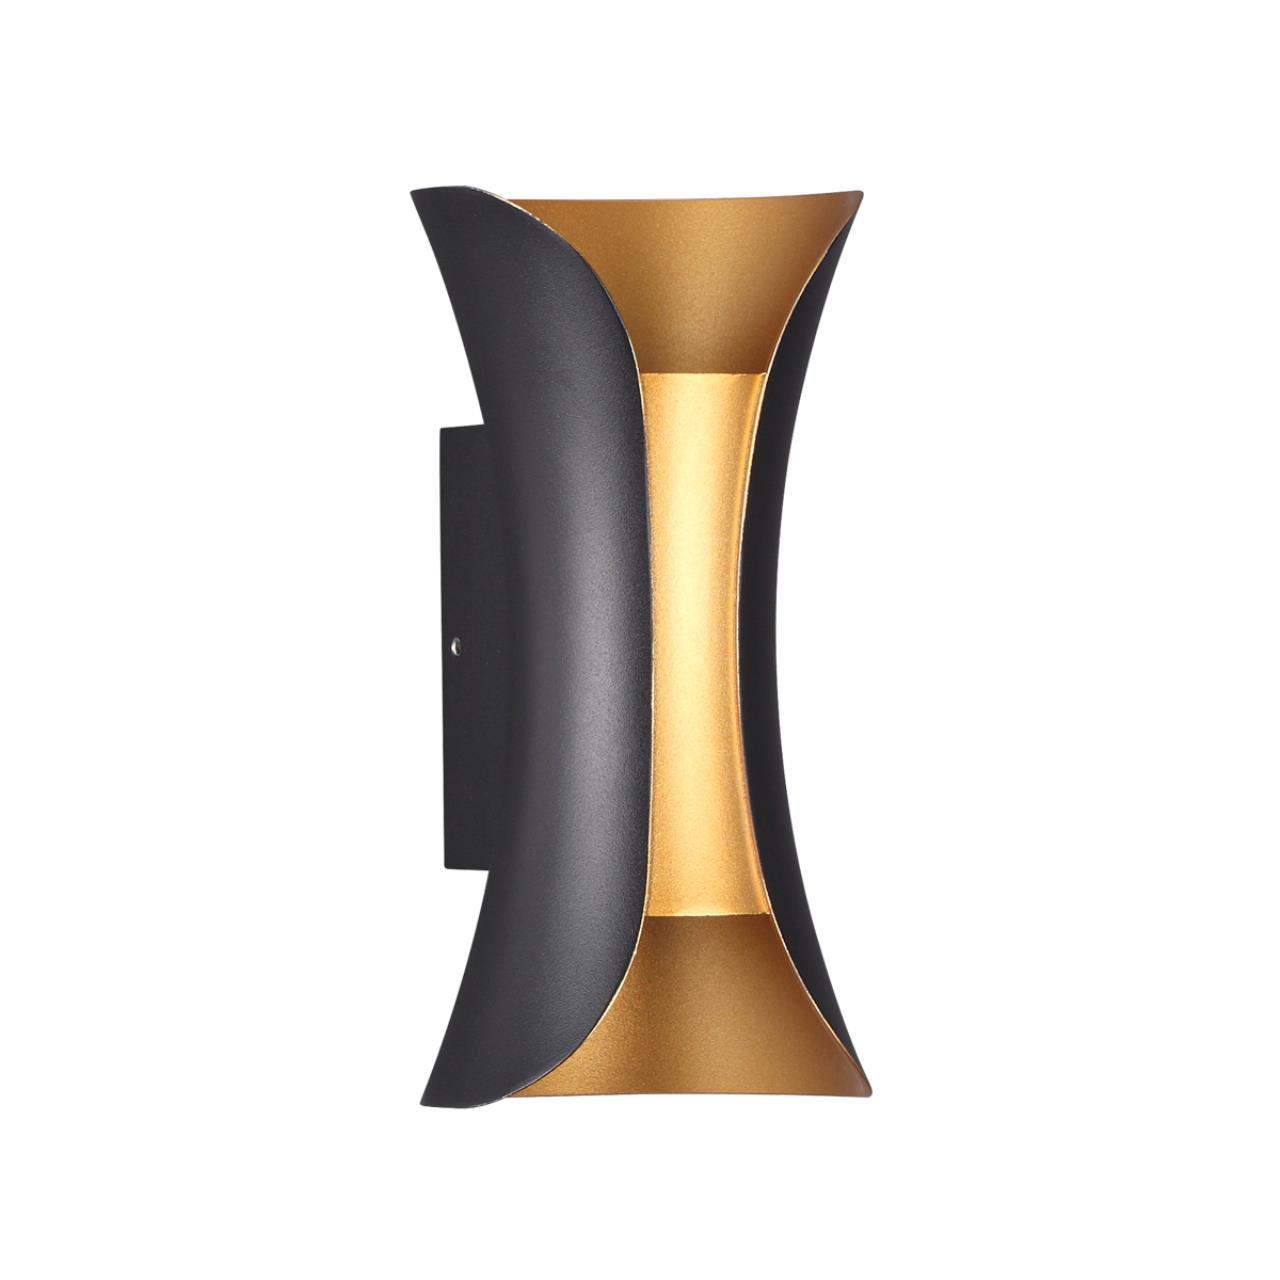 3886/6BG HIGHTECH ODL20 177 черный/золотистый/металл Настенный светильник LED 4000K 6W 220V IP54 KRI